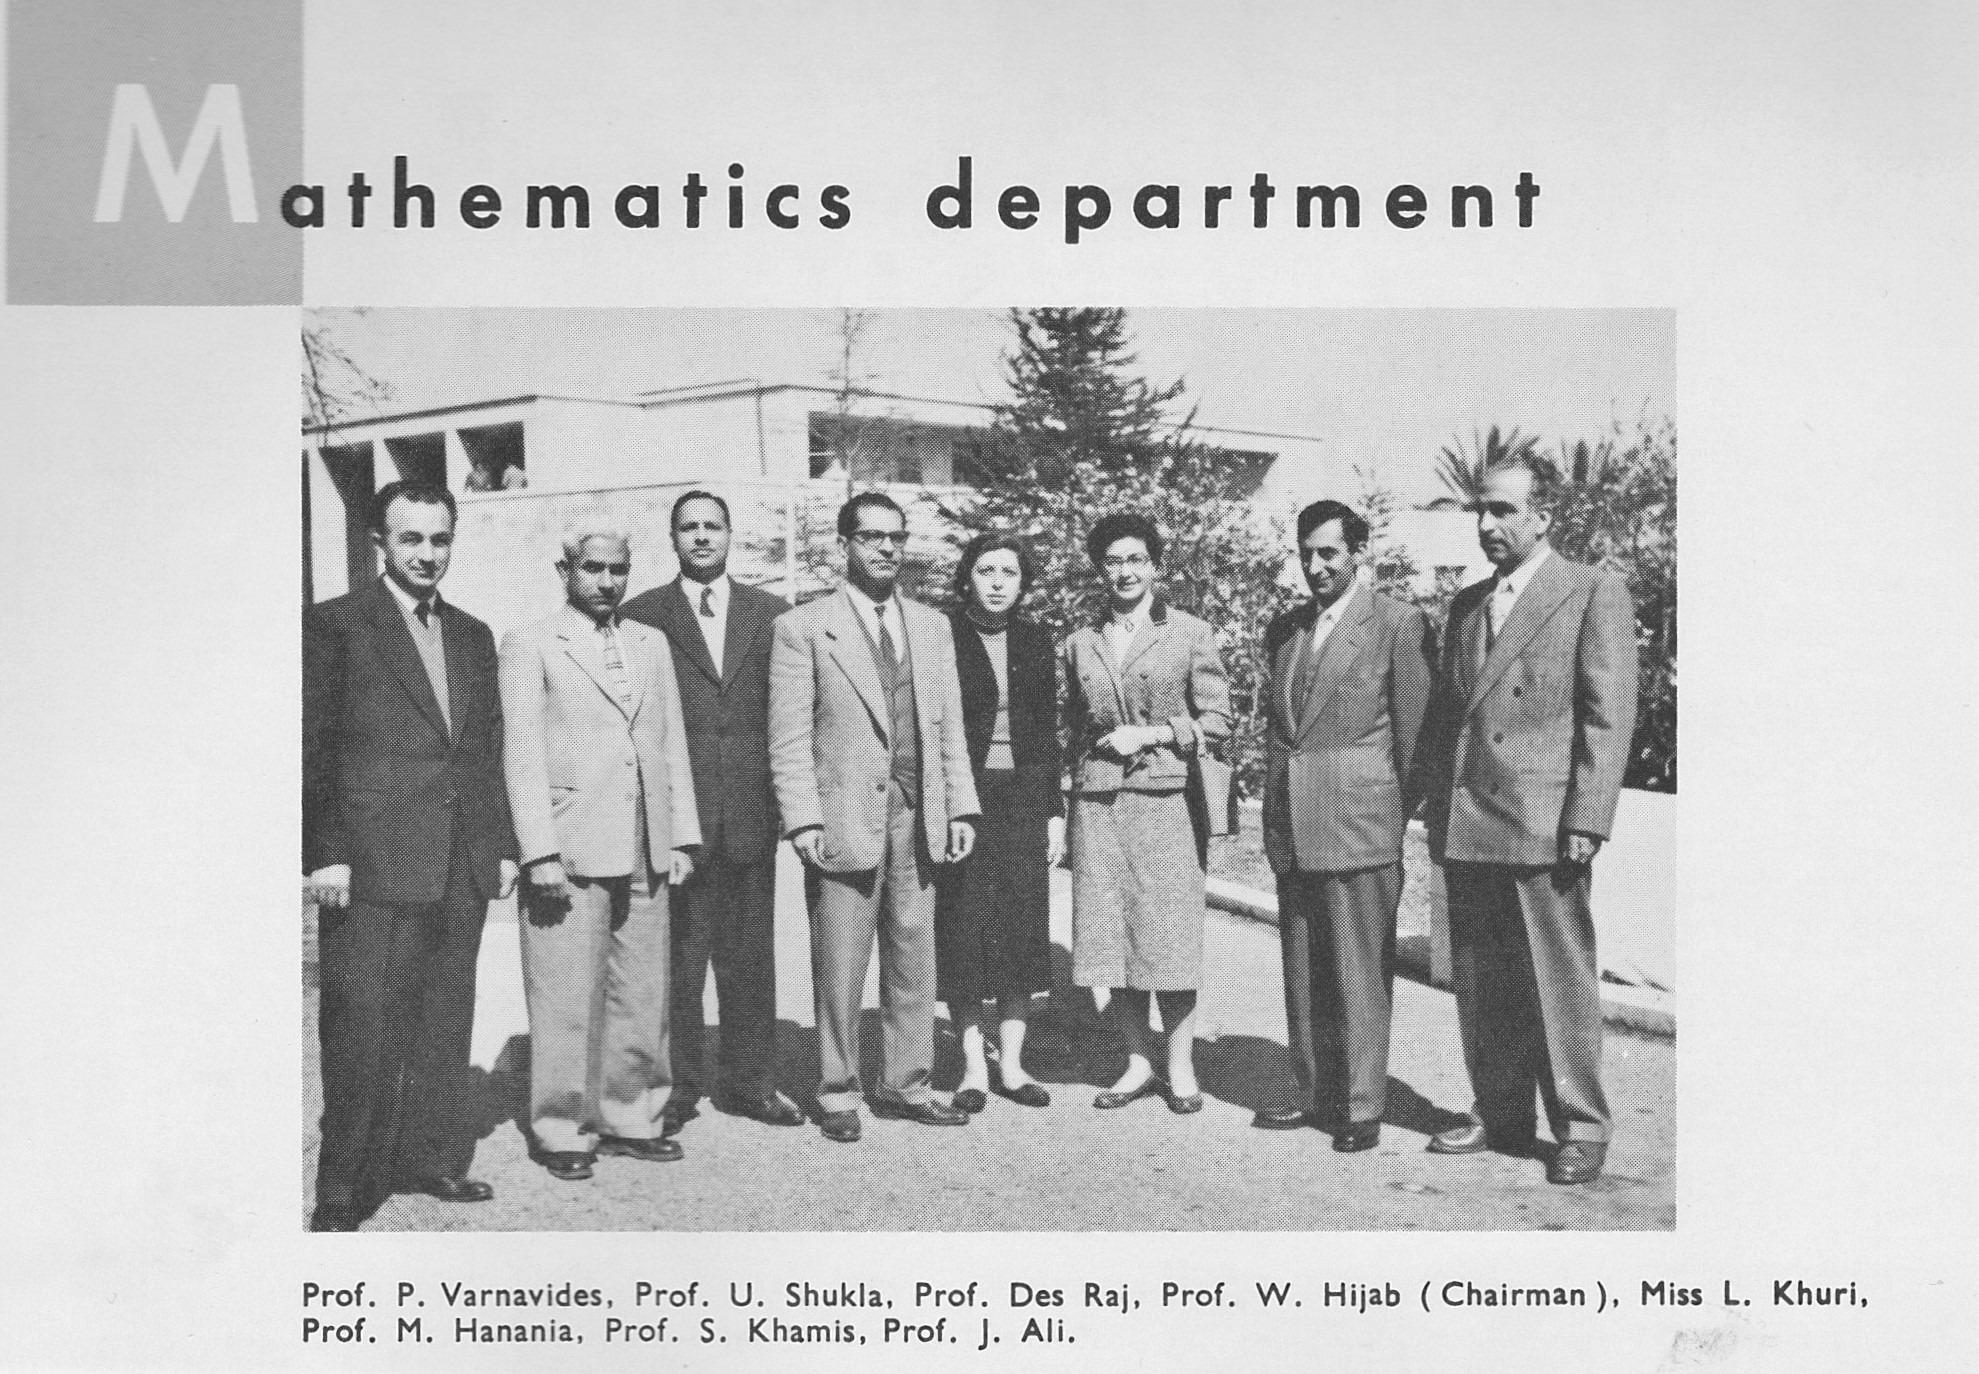 Members of Maths Dept AUB 1958